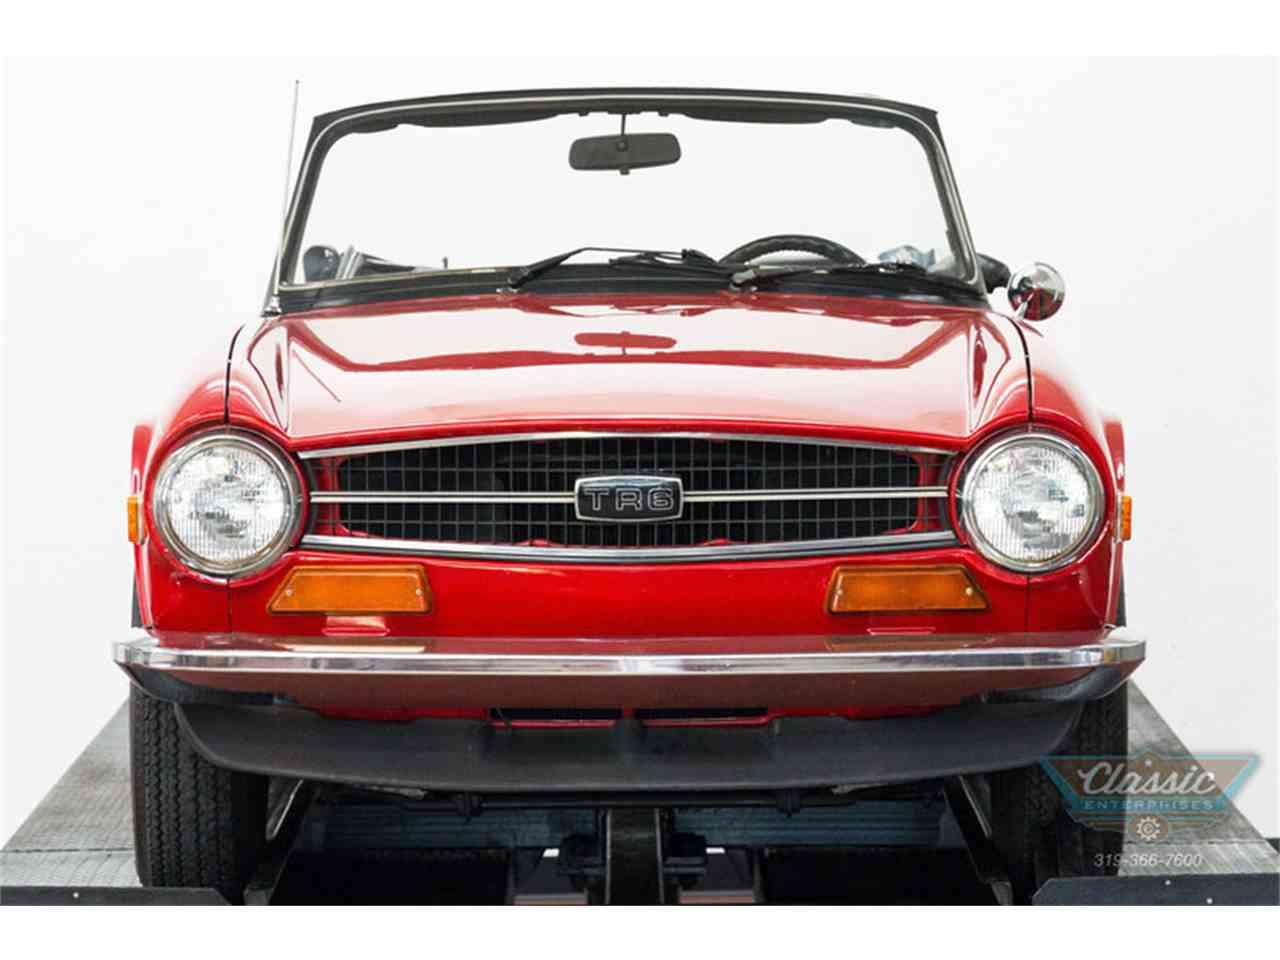 1973 Triumph TR6 for Sale | ClassicCars.com | CC-850276